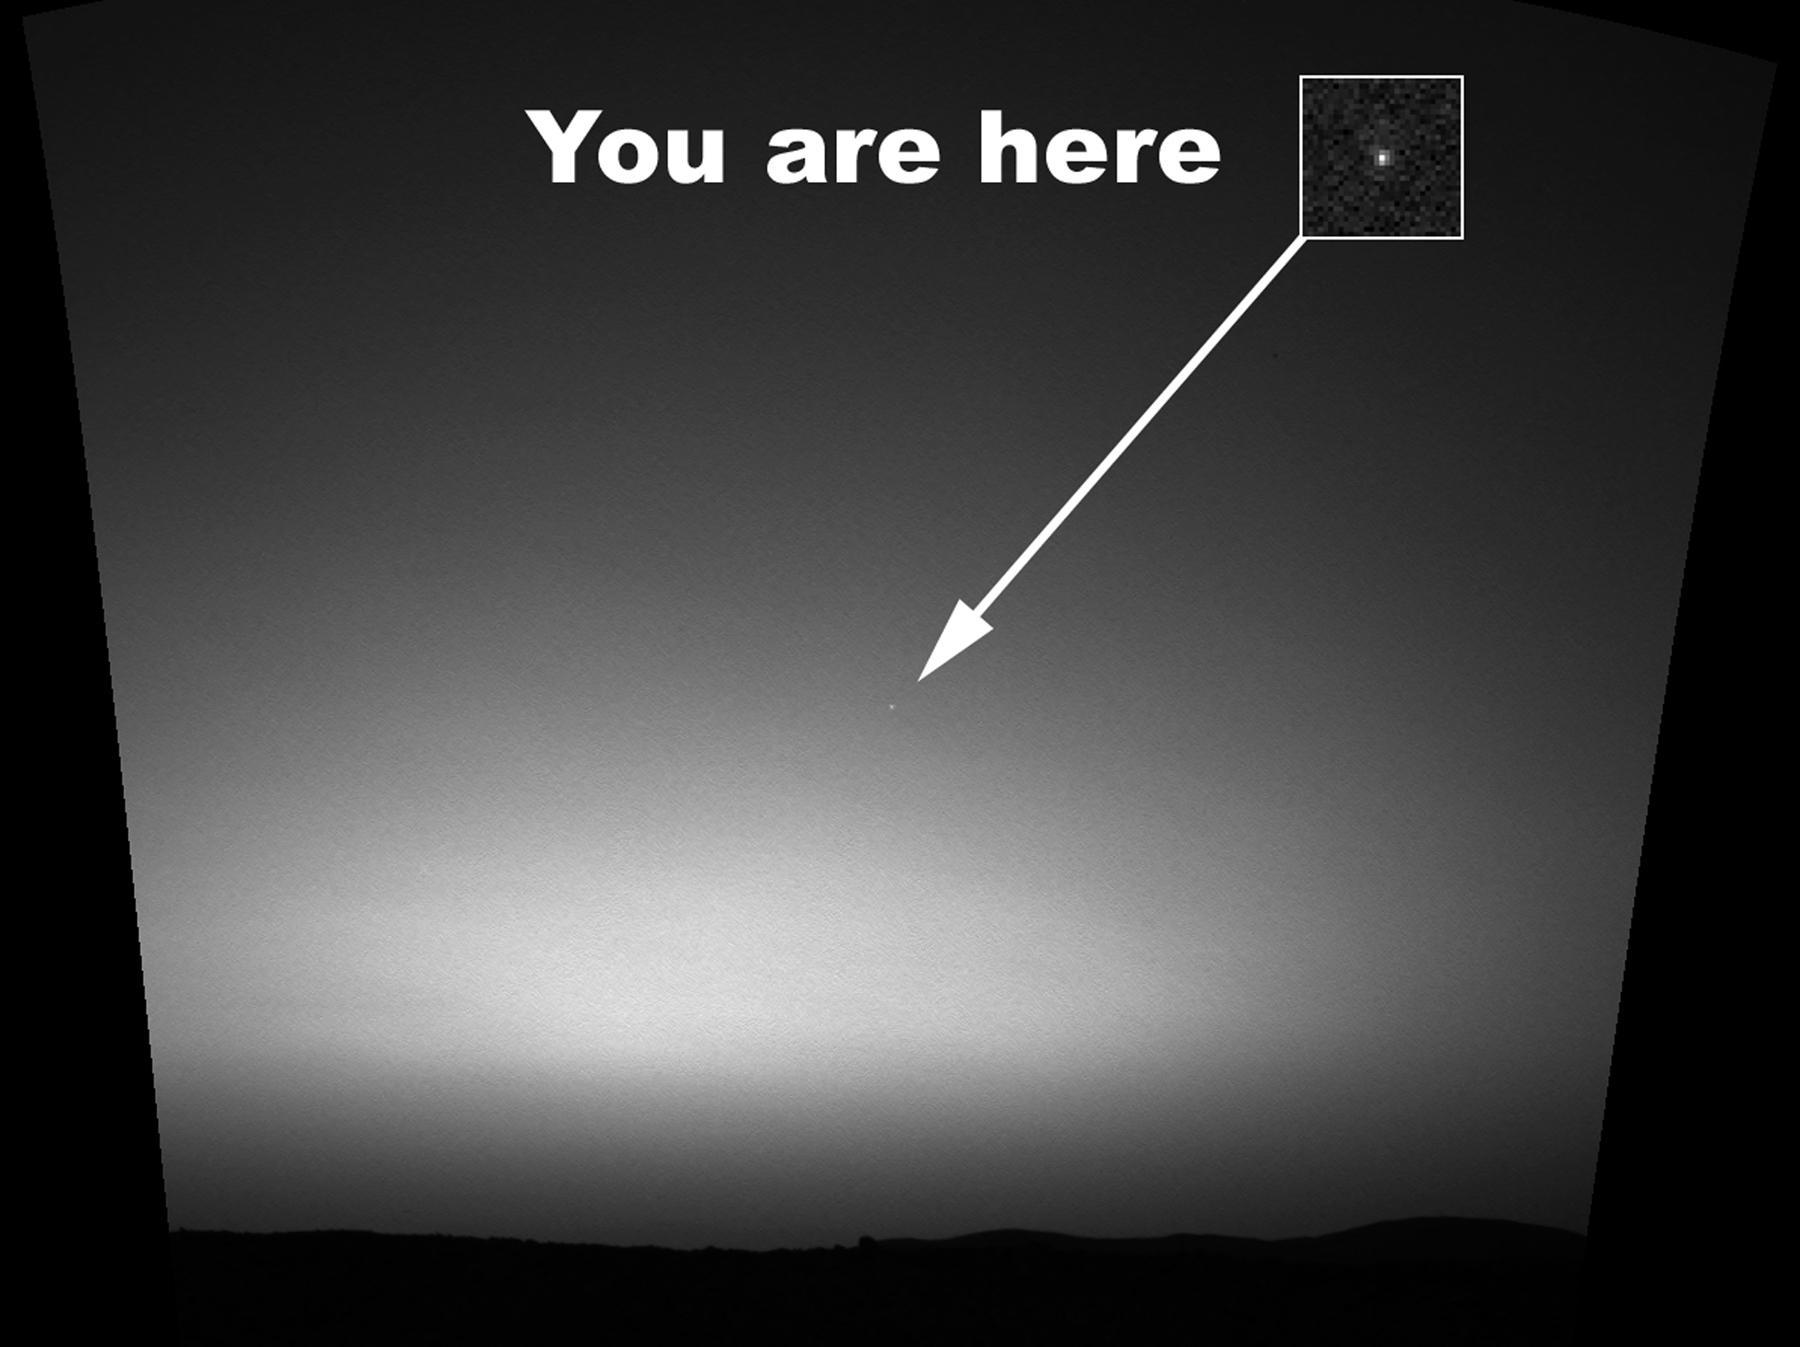 вездеход Spirit снимок Земли с Марса